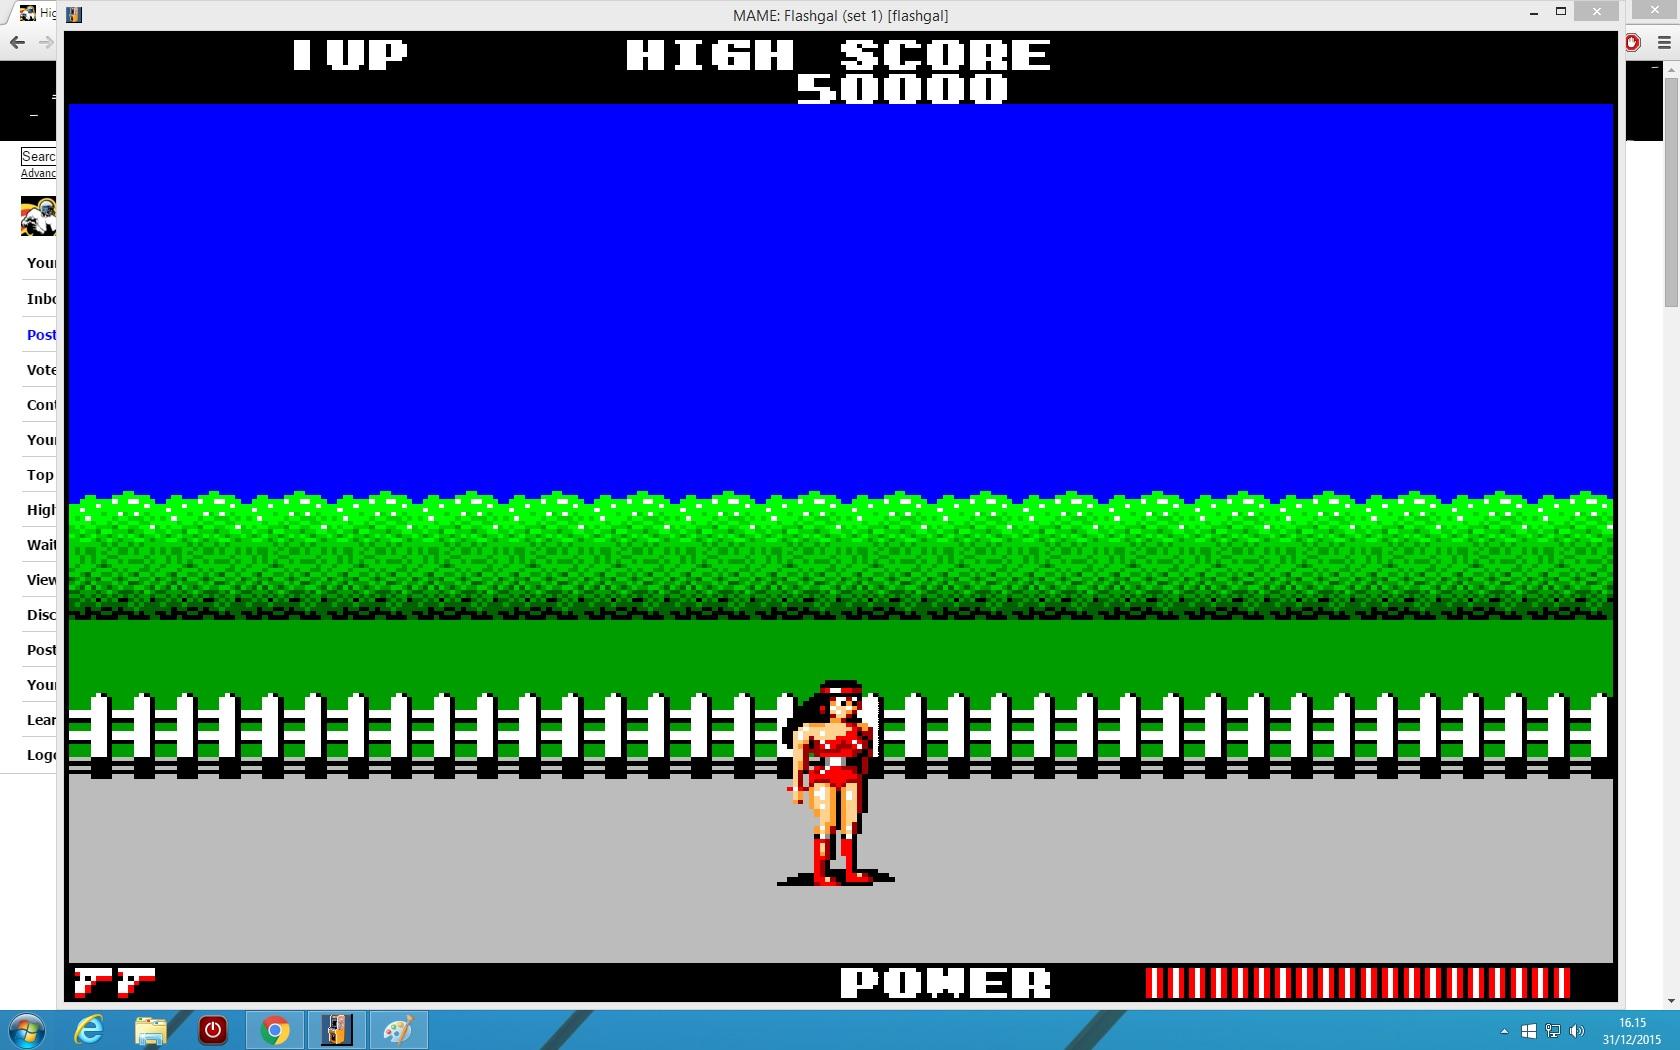 lenny2571: Flashgal [flashgal] (Arcade Emulated / M.A.M.E.) 27,540 points on 2015-12-31 09:16:00